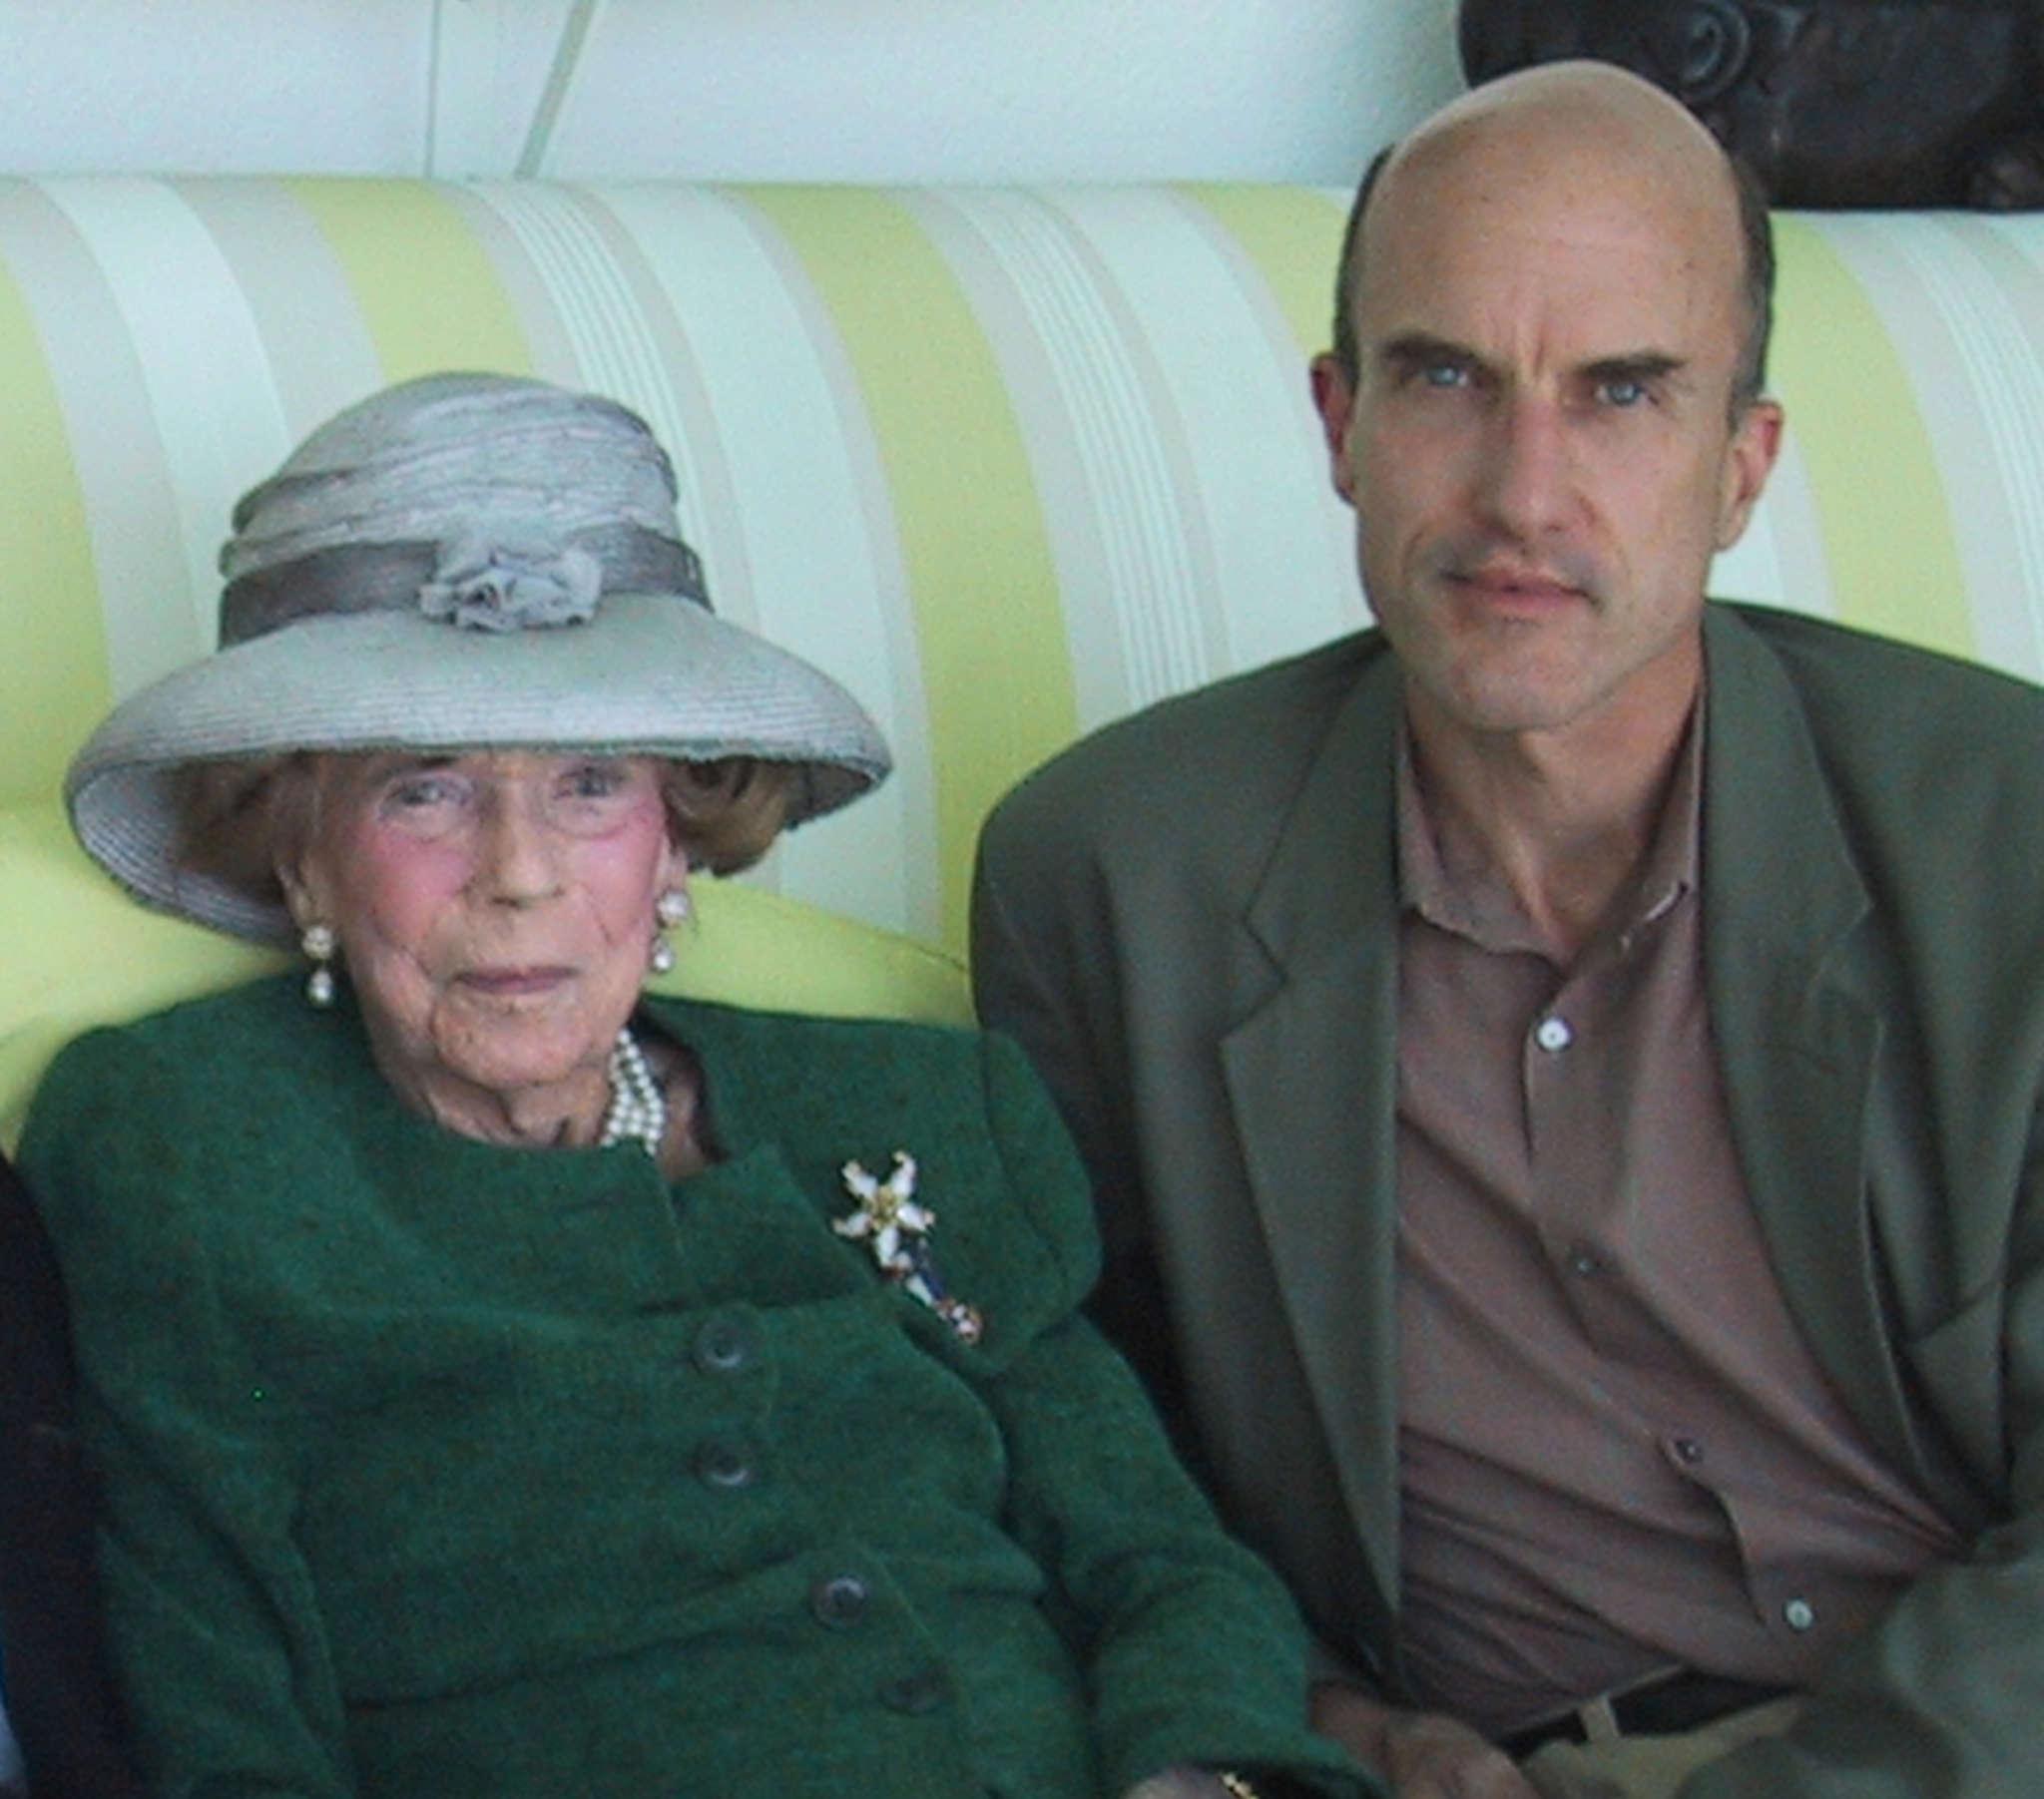 The late millionaire socialite Brooke Astor and grandson Philip Marshall.